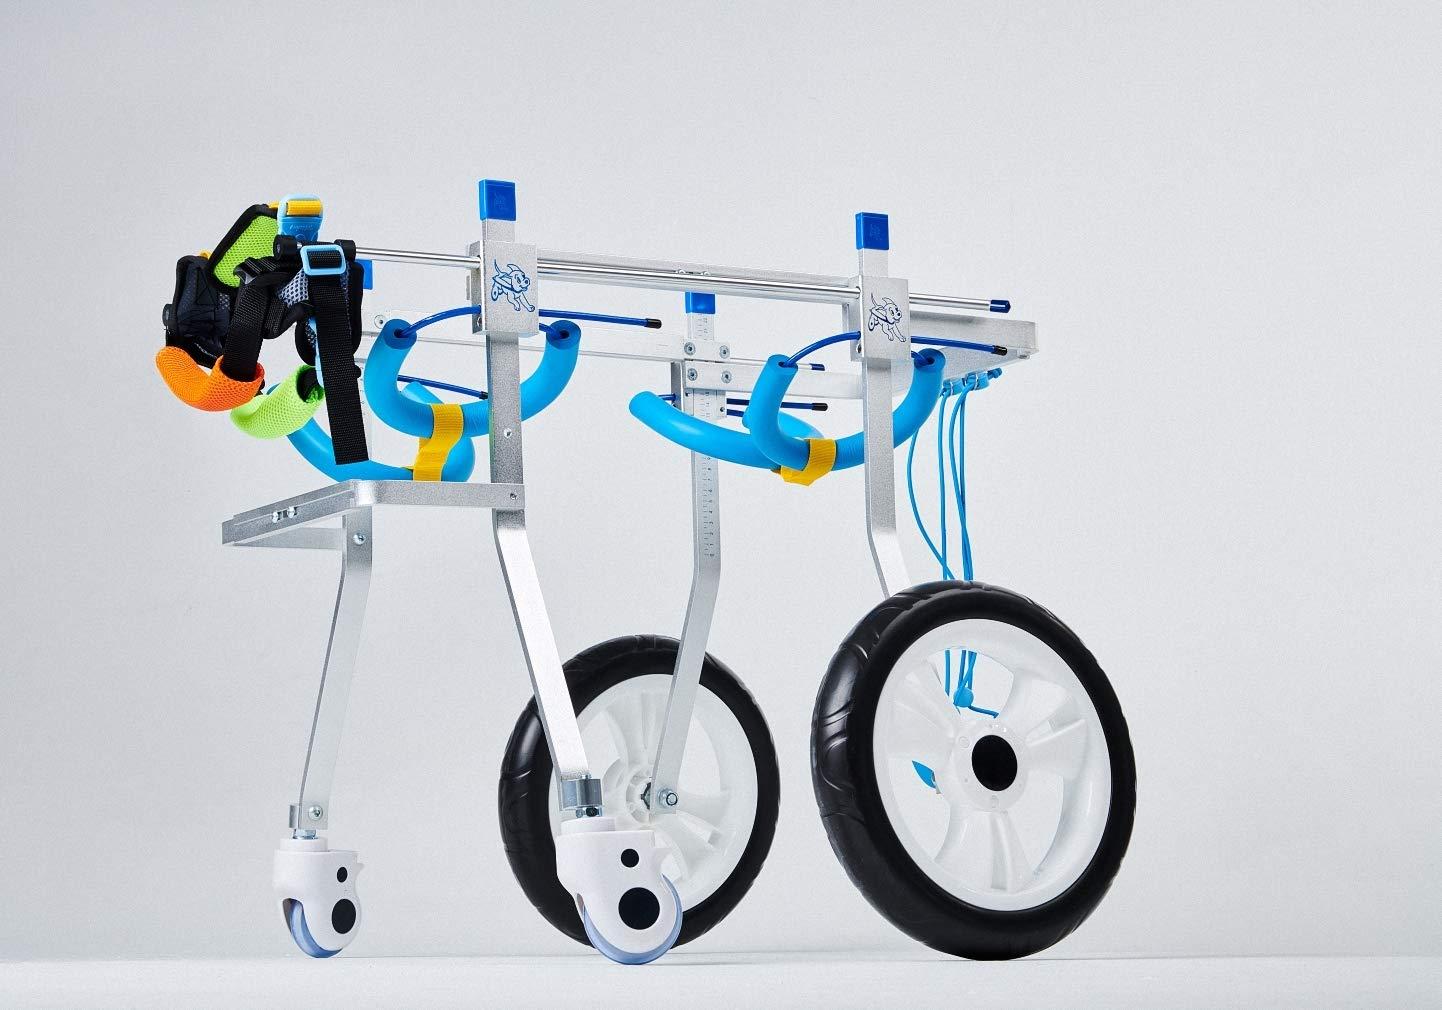 L Adjustable Dog Pet Wheelchair, Hind Leg Rehabilitation Aid for Aging, Disable, Injured, Arthritis, Weak Dog Cat Pet, 4 Wheels